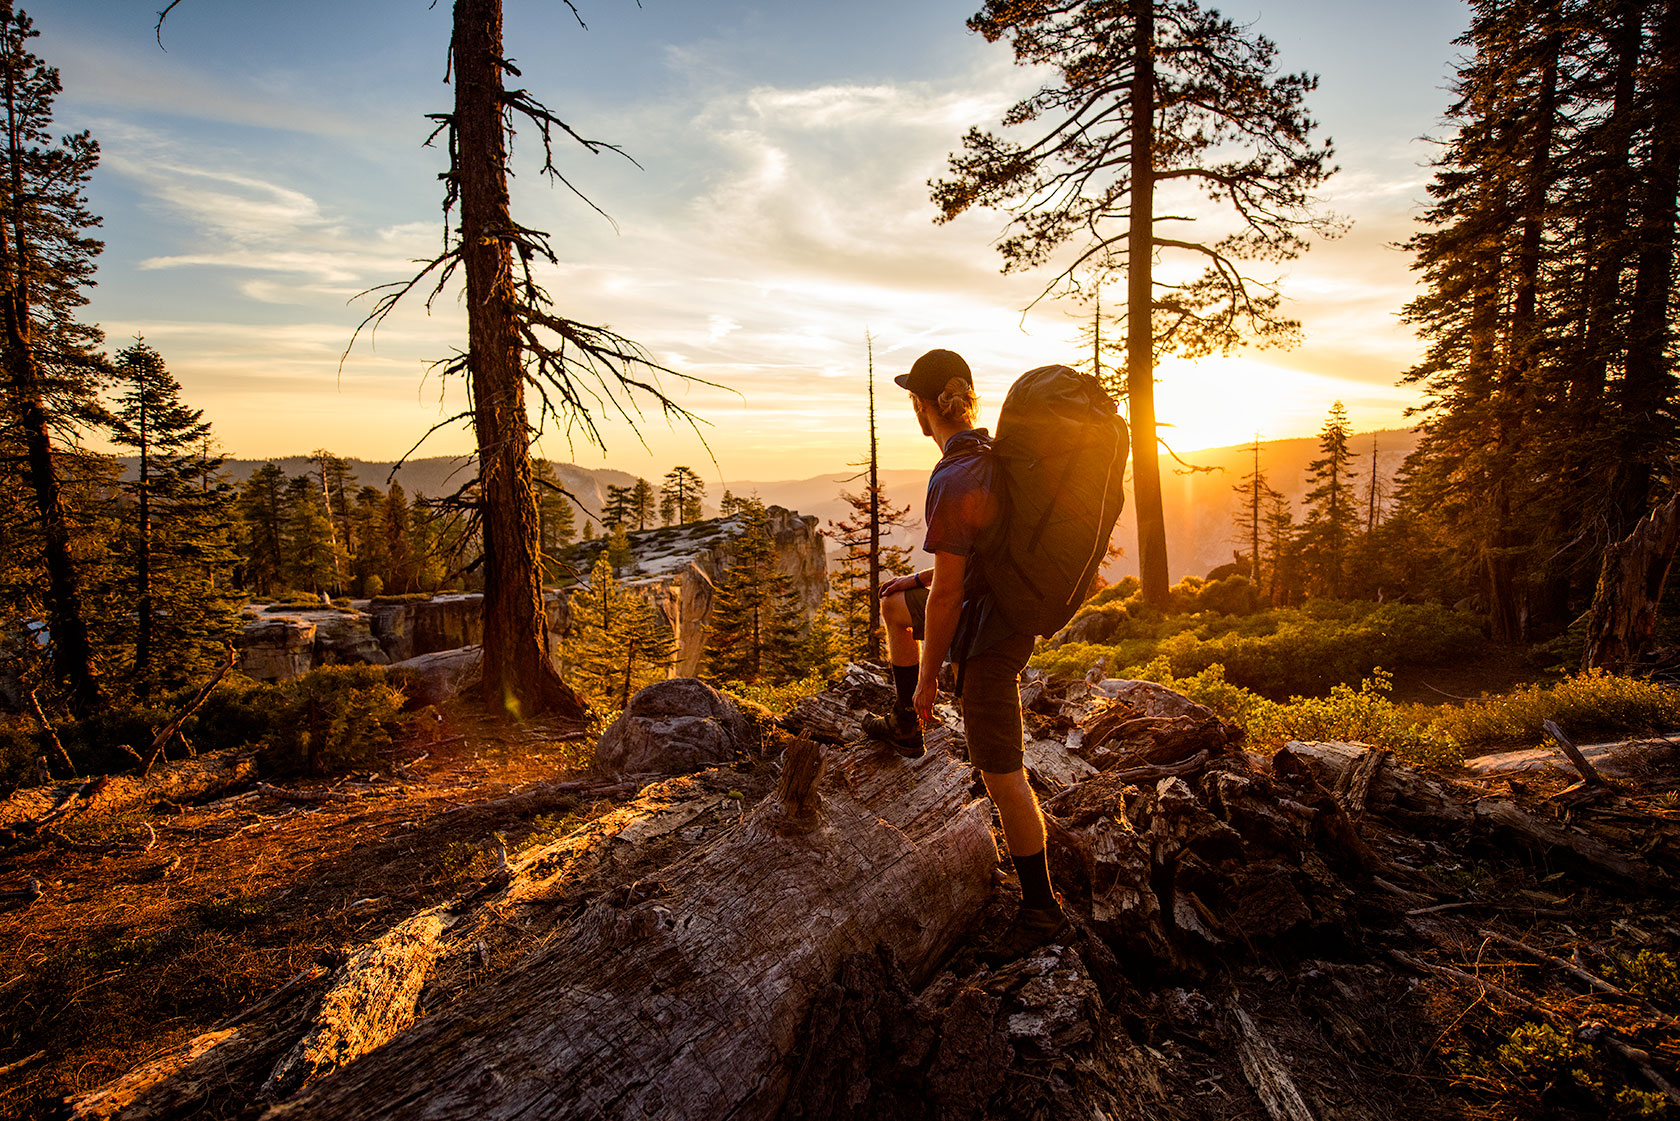 austin-trigg-wing-suit-base-jump-fly-hike-yosemite-lifestyle-california-adventure-thrill-seeking-taft-point-sunset.jpg